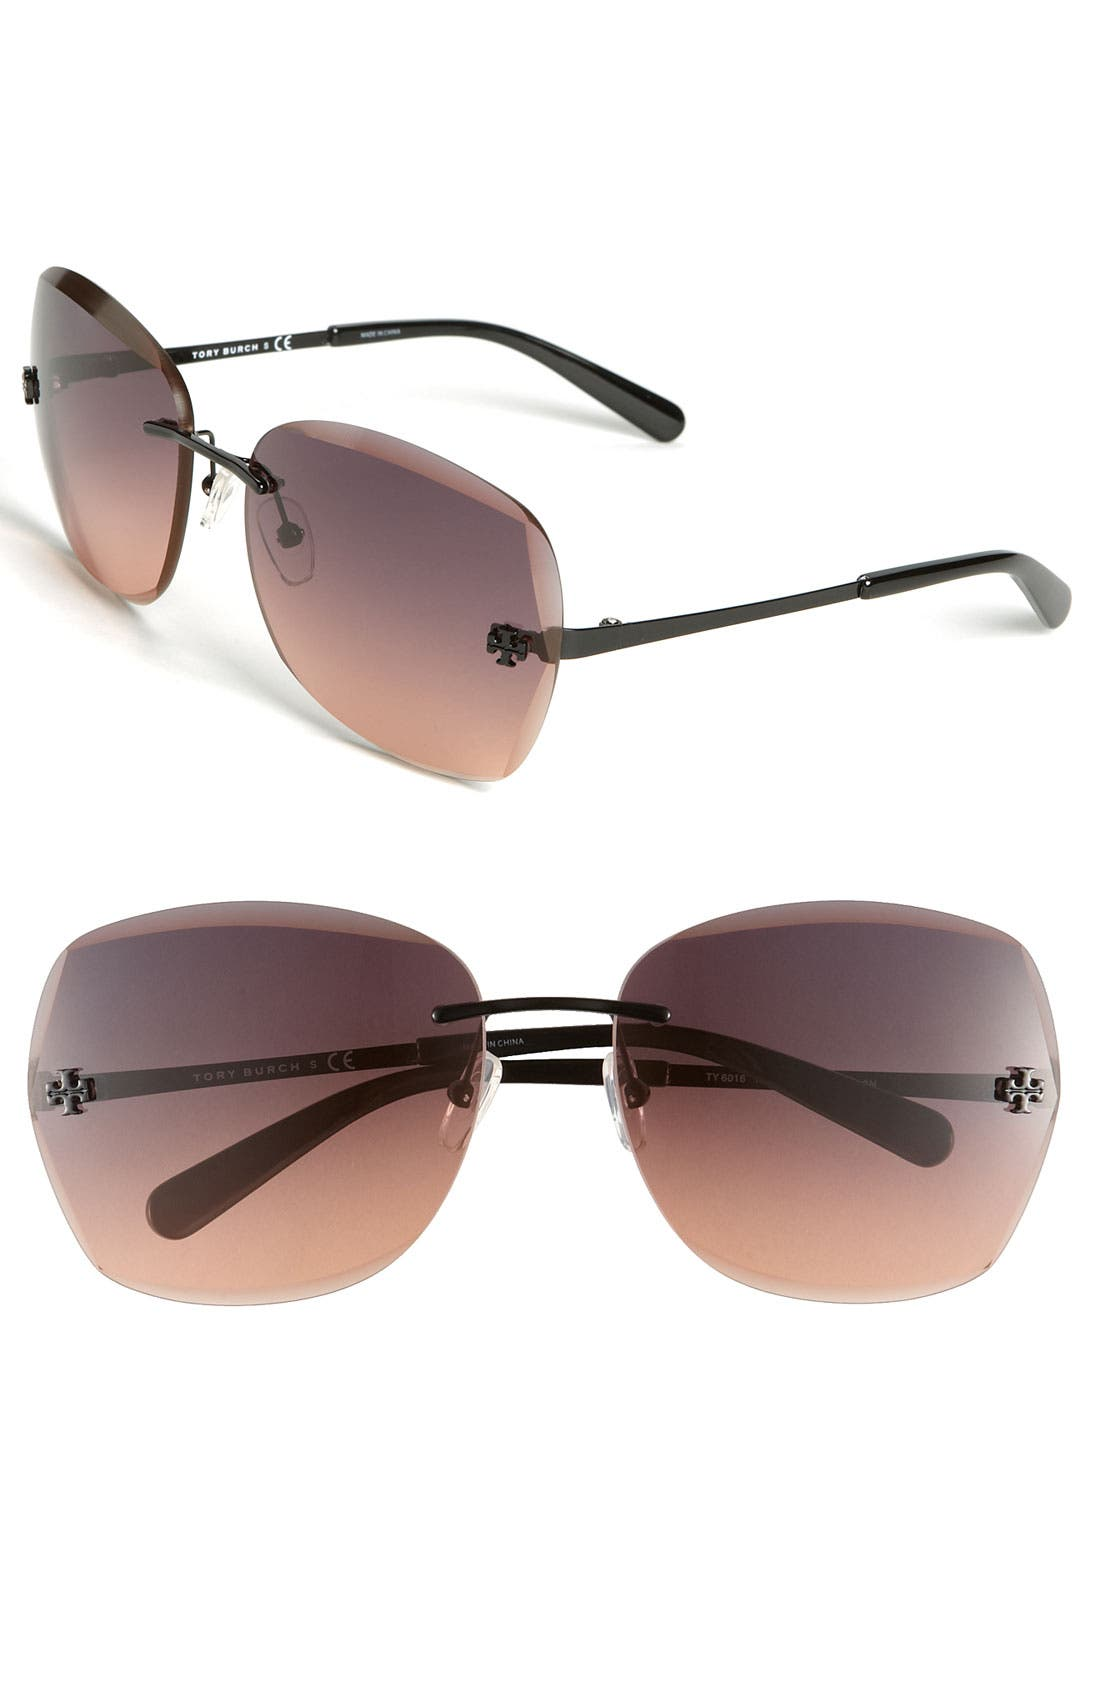 Main Image - Tory Burch Rimless Sunglasses